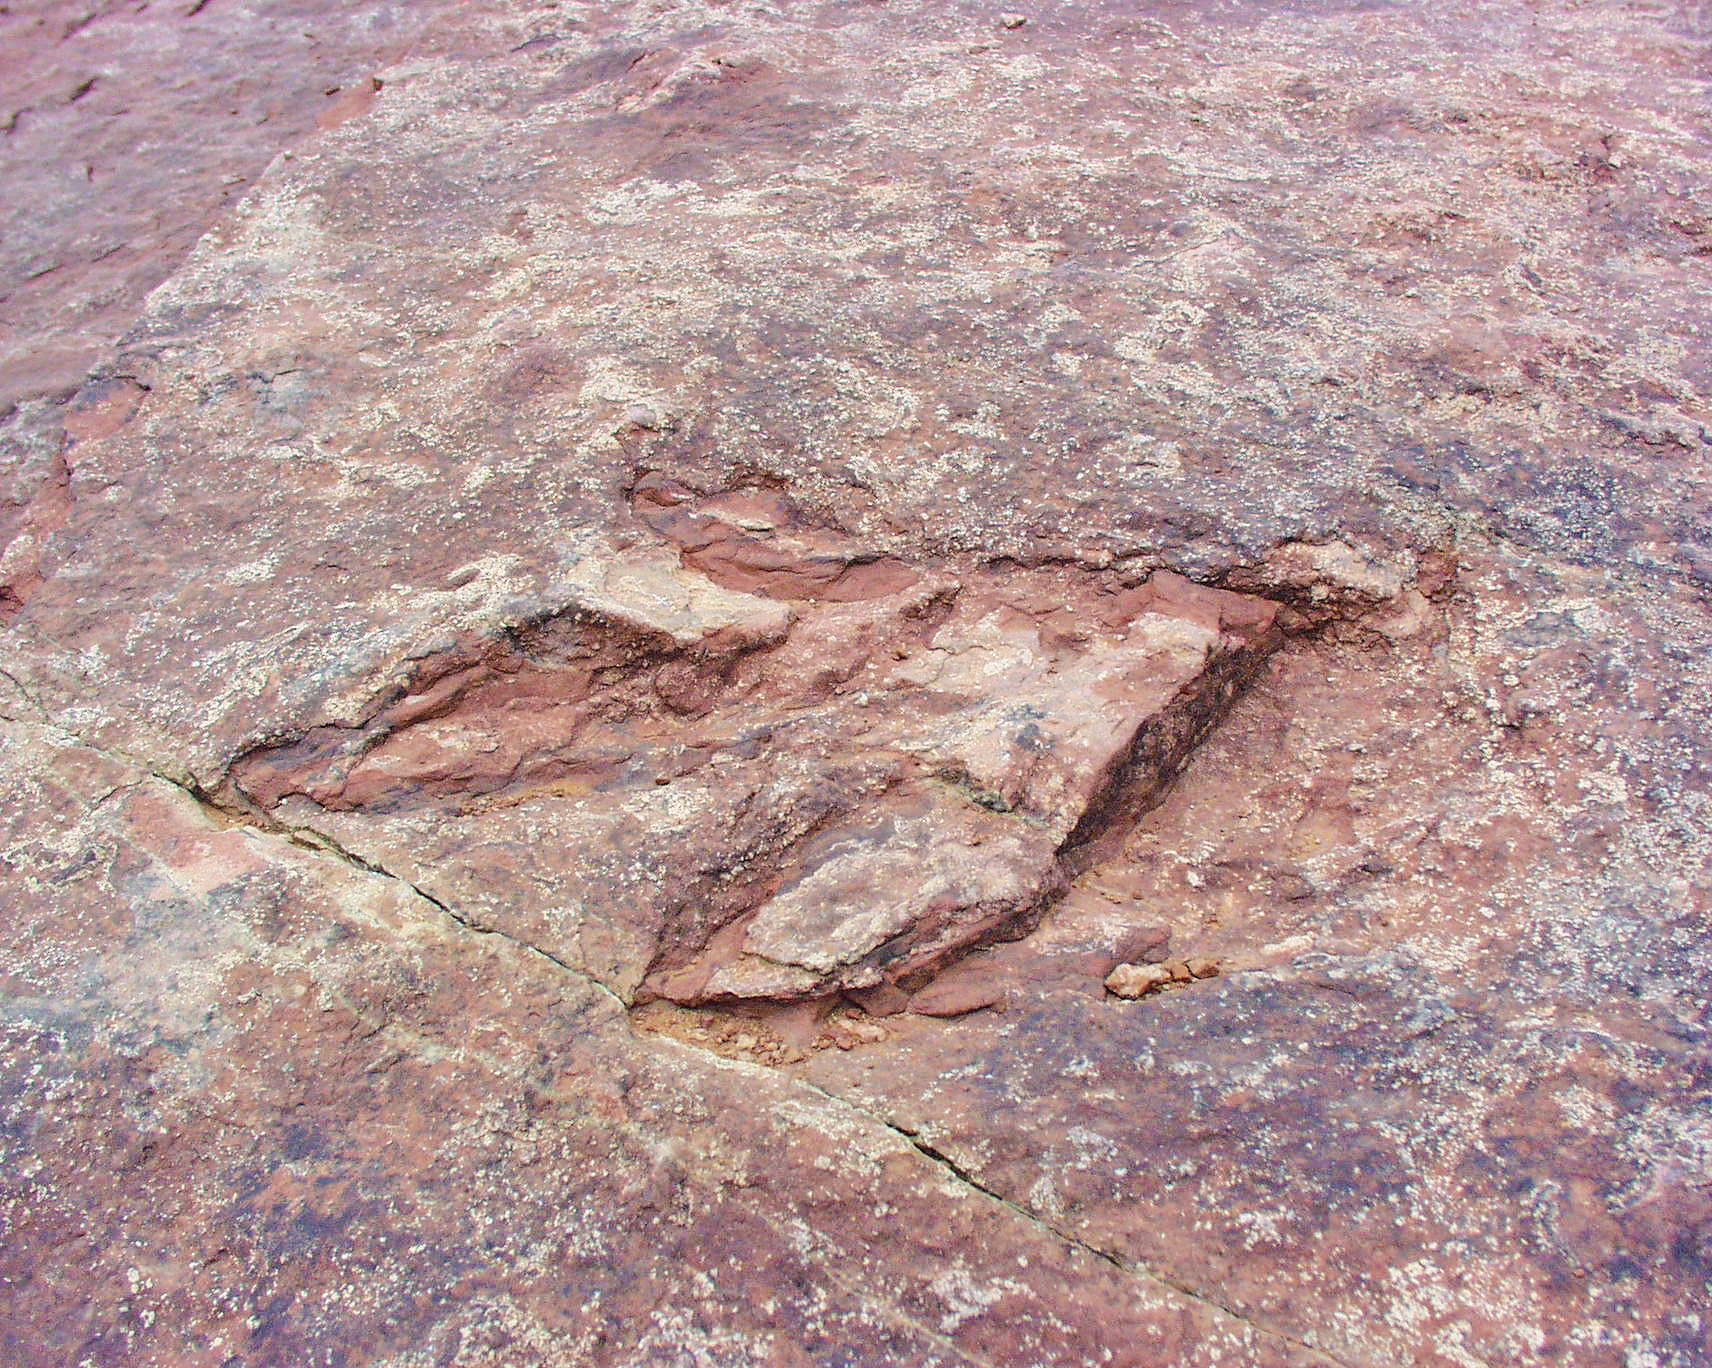 Dinosaur track at Red Fleet State Park